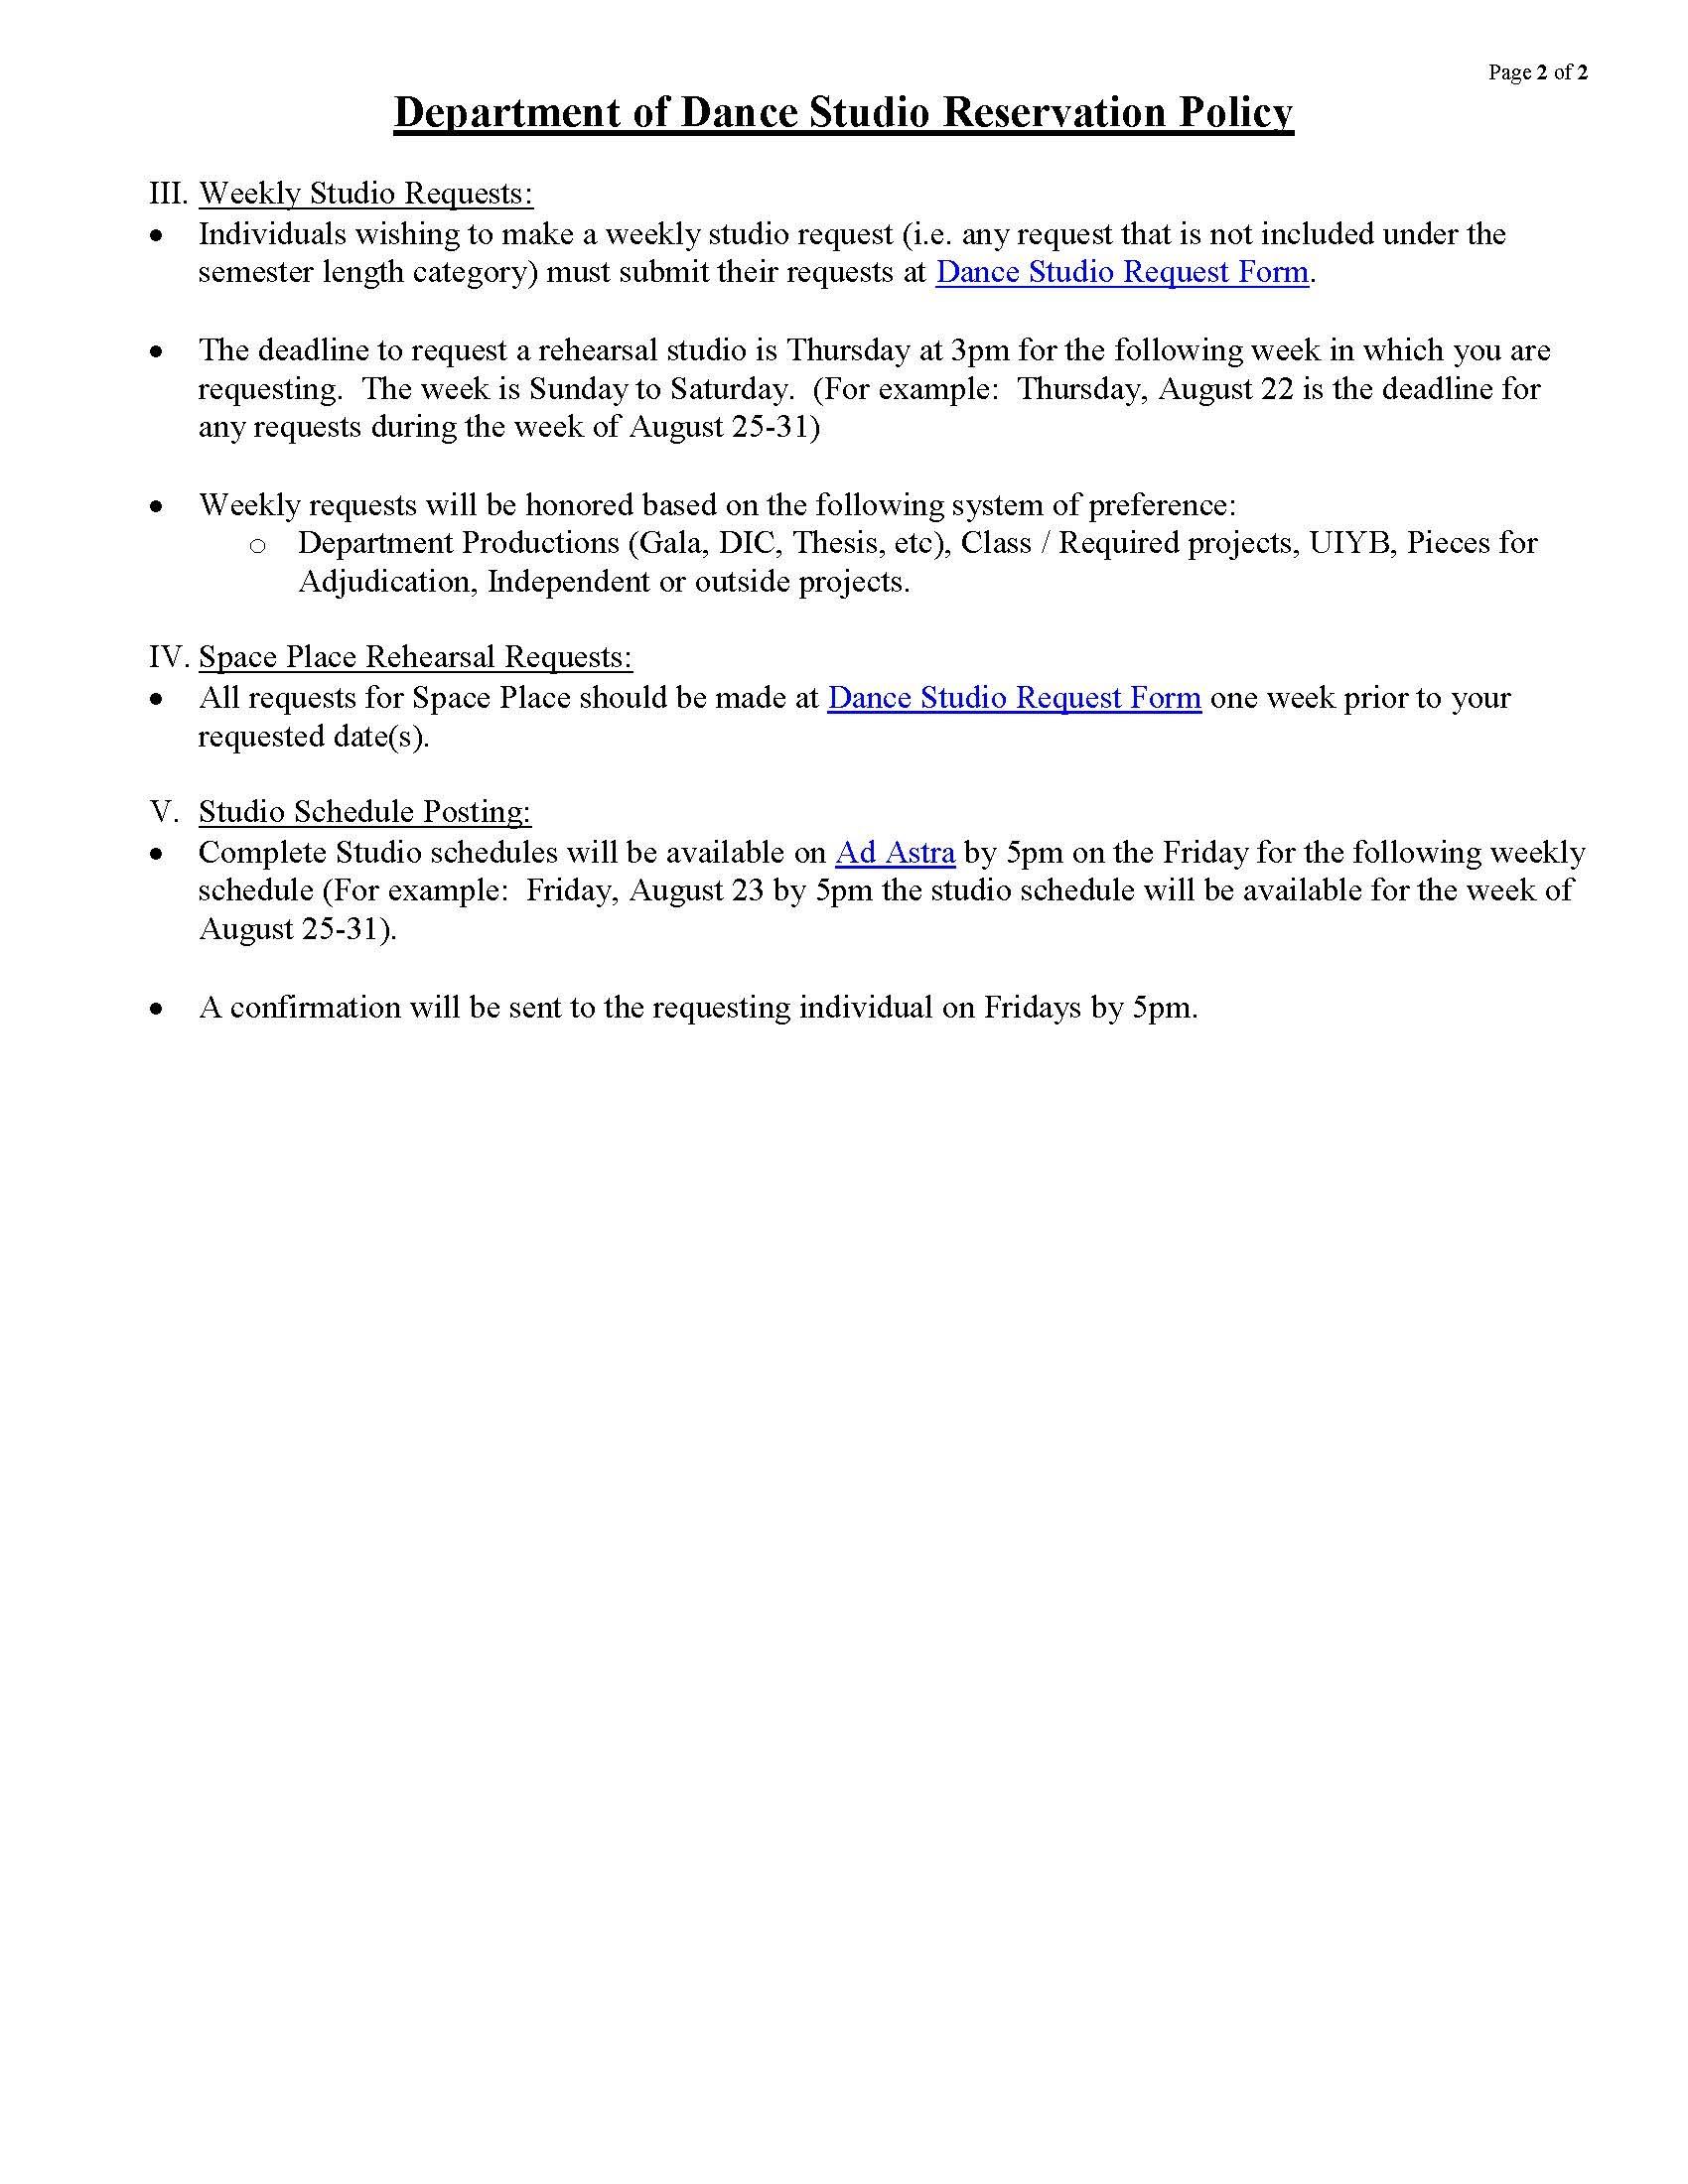 Studio Reservation Policy - Department of Dance - UIowa Wiki